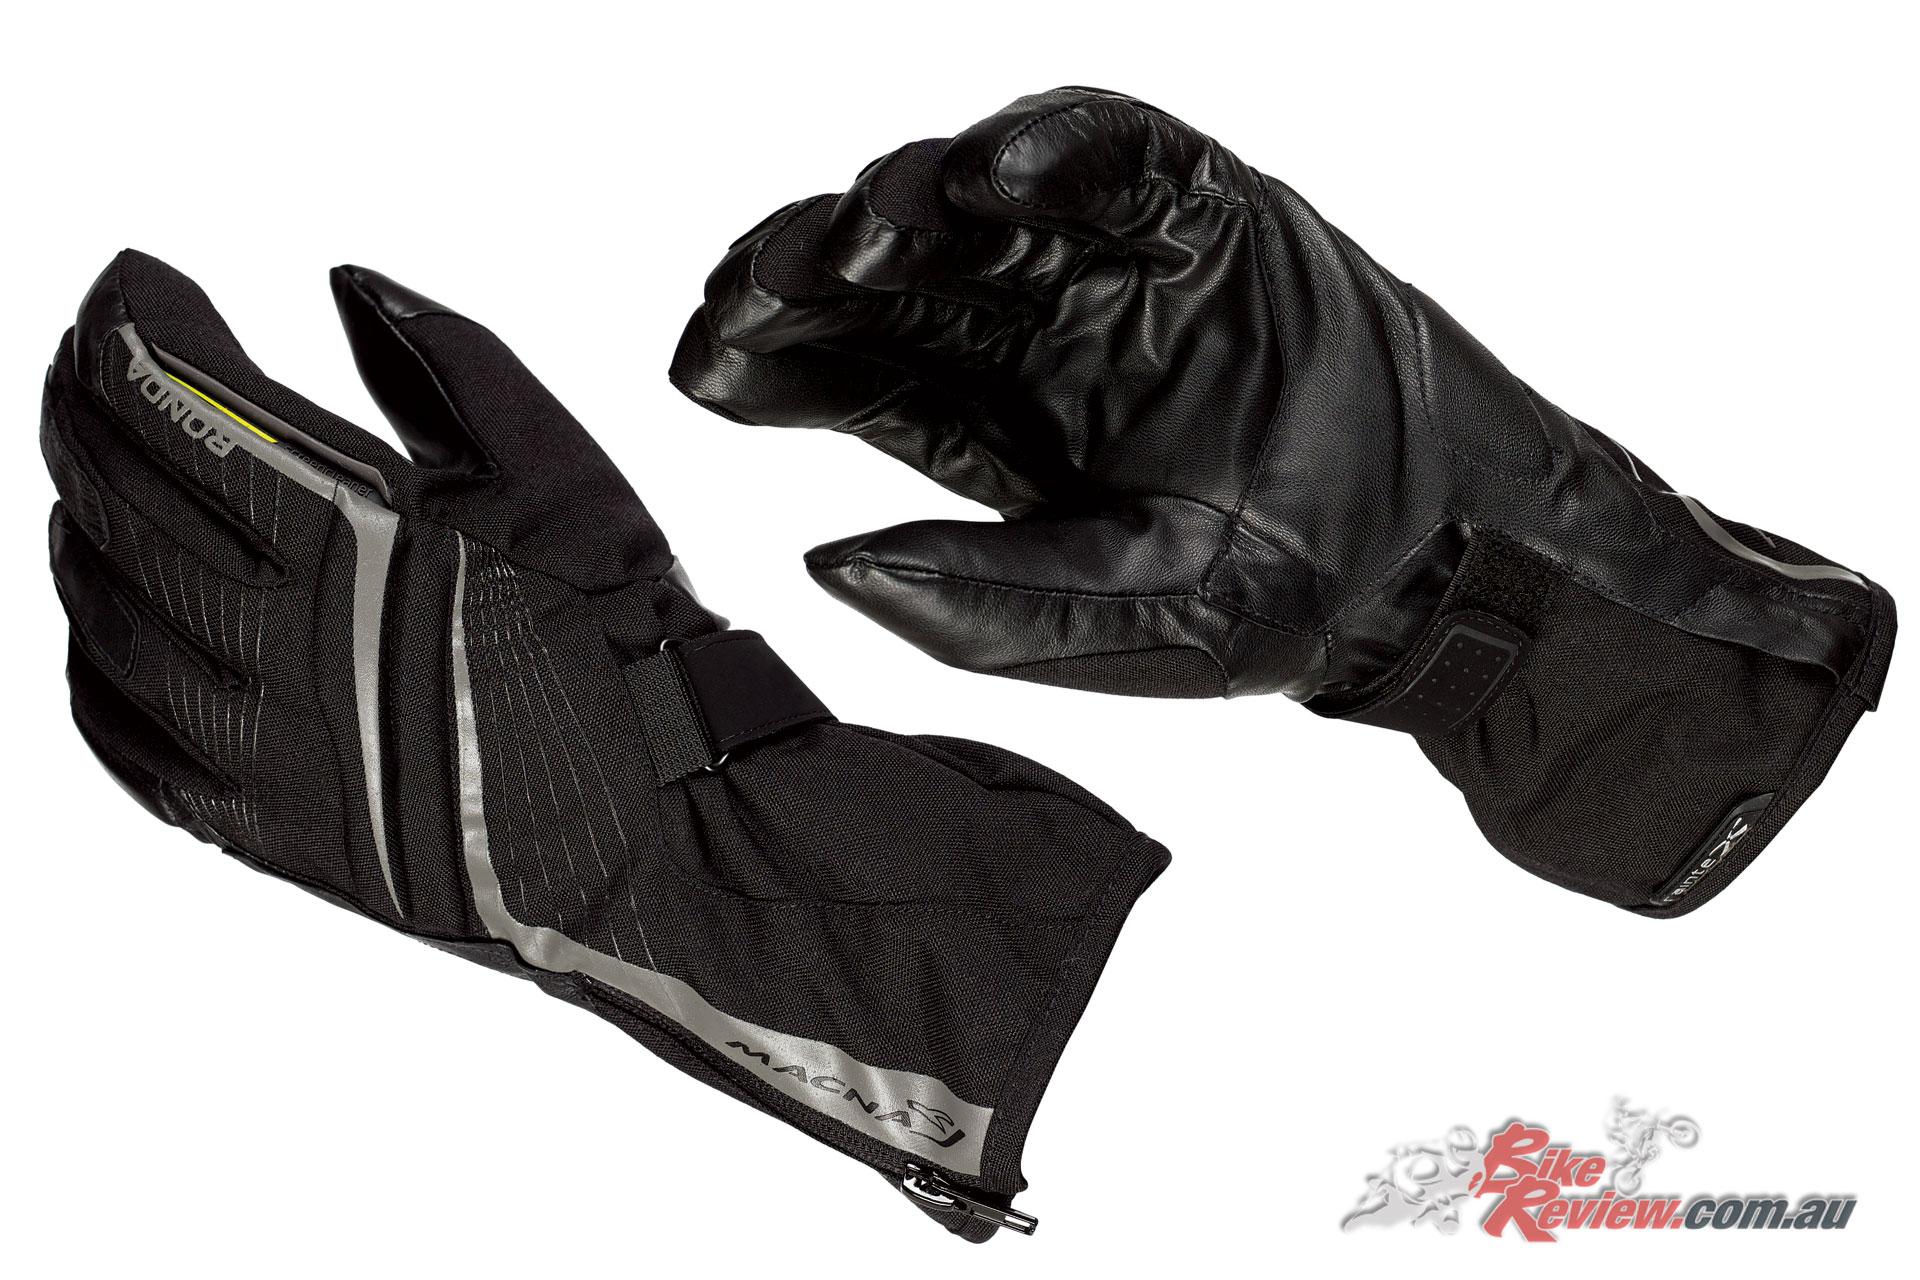 Macna Ladies Ronda Gloves - $89.95 RRP